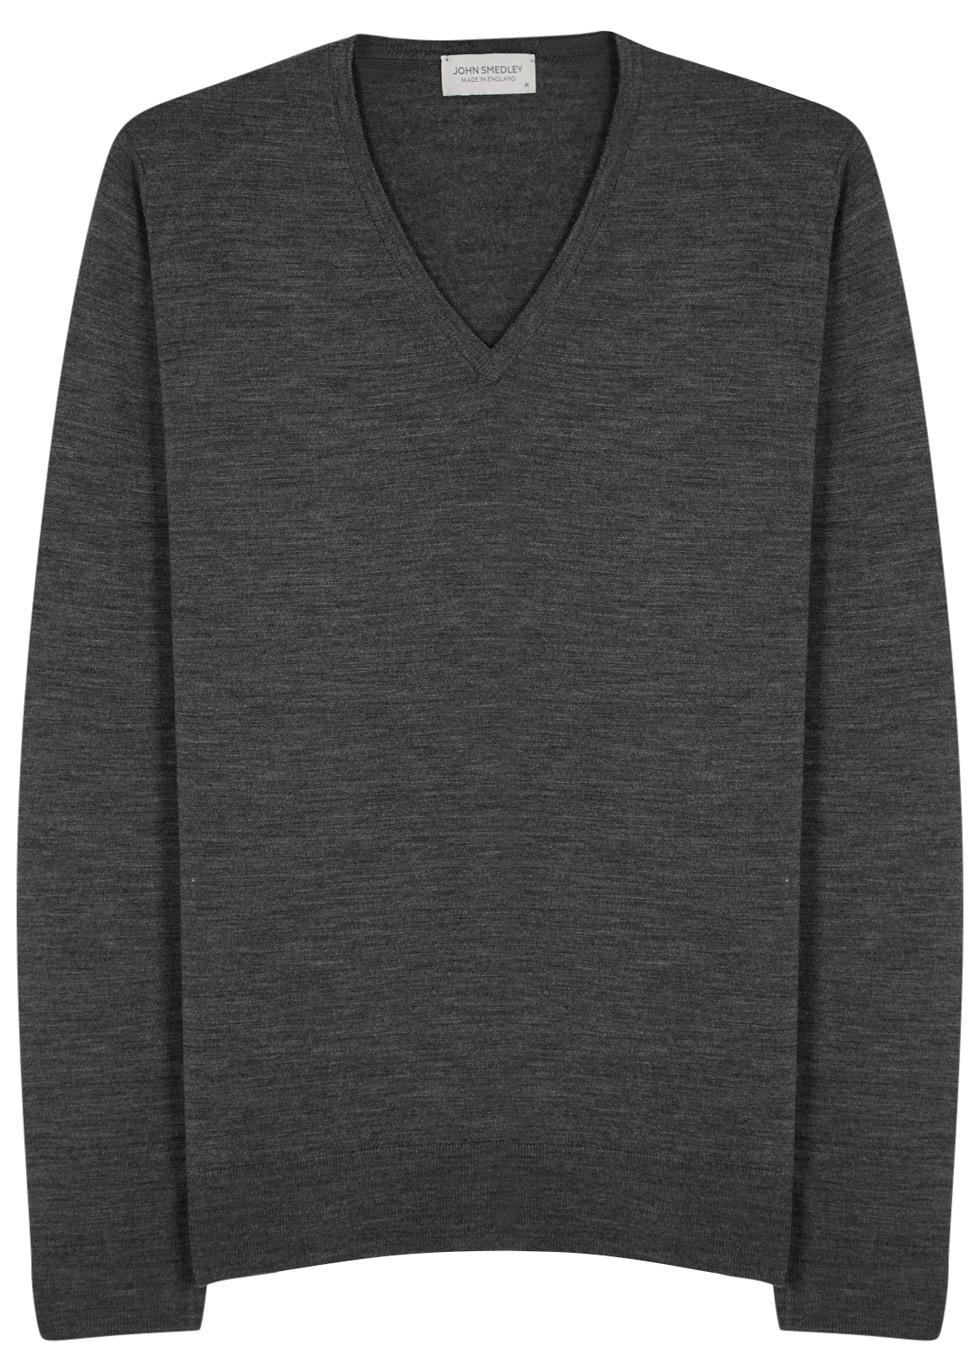 Blenheim charcoal fine-knit wool jumper - John Smedley